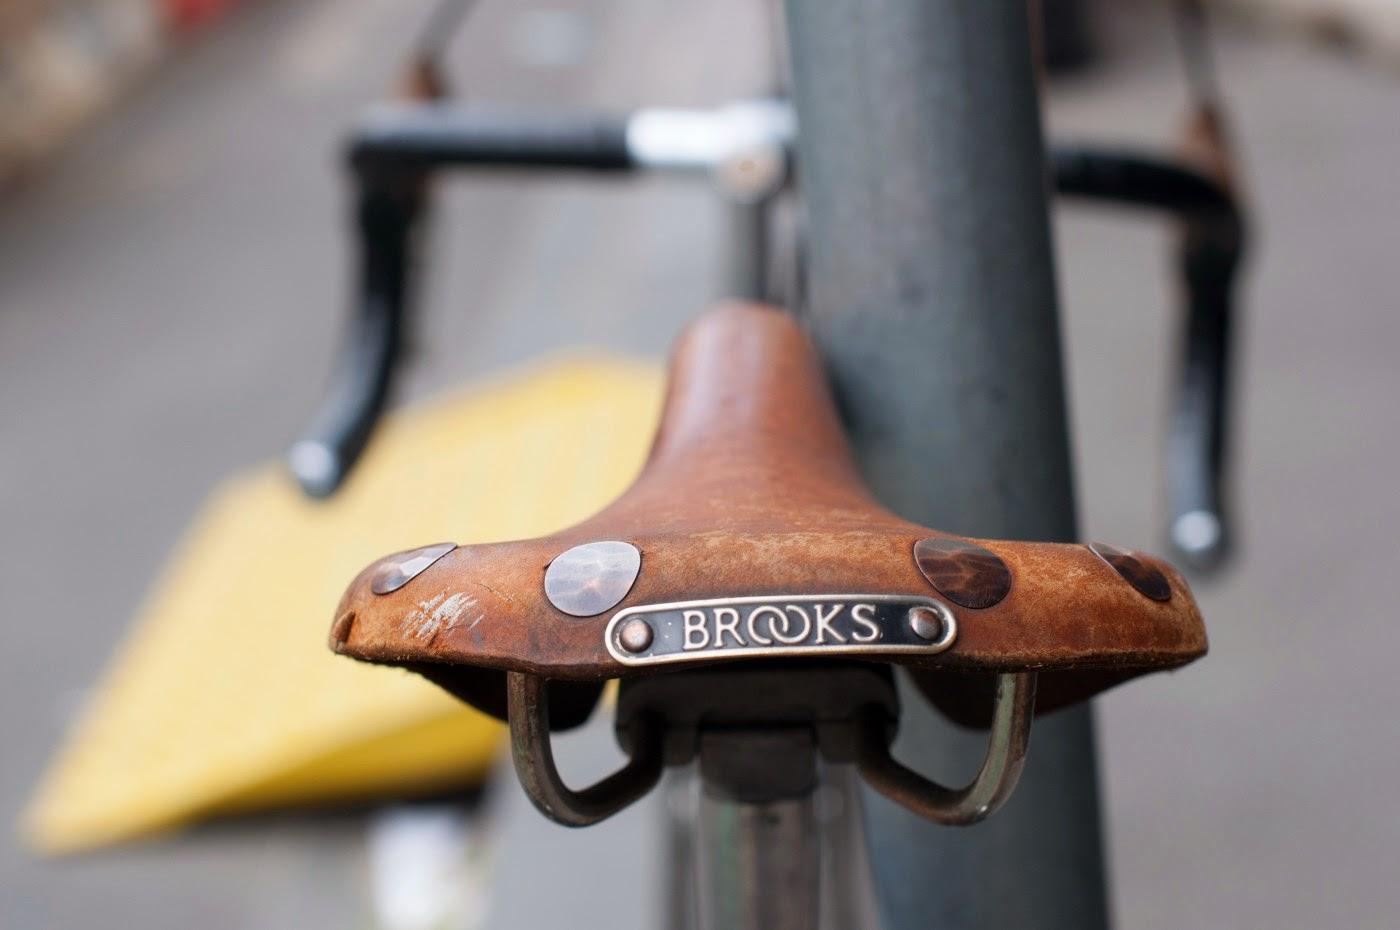 Nishiki, custom sport, 14 speed road bike, Swanston St, Melbourne, Australia, Tim Macauley, the Biketorialist, bespoke, frame, shimano